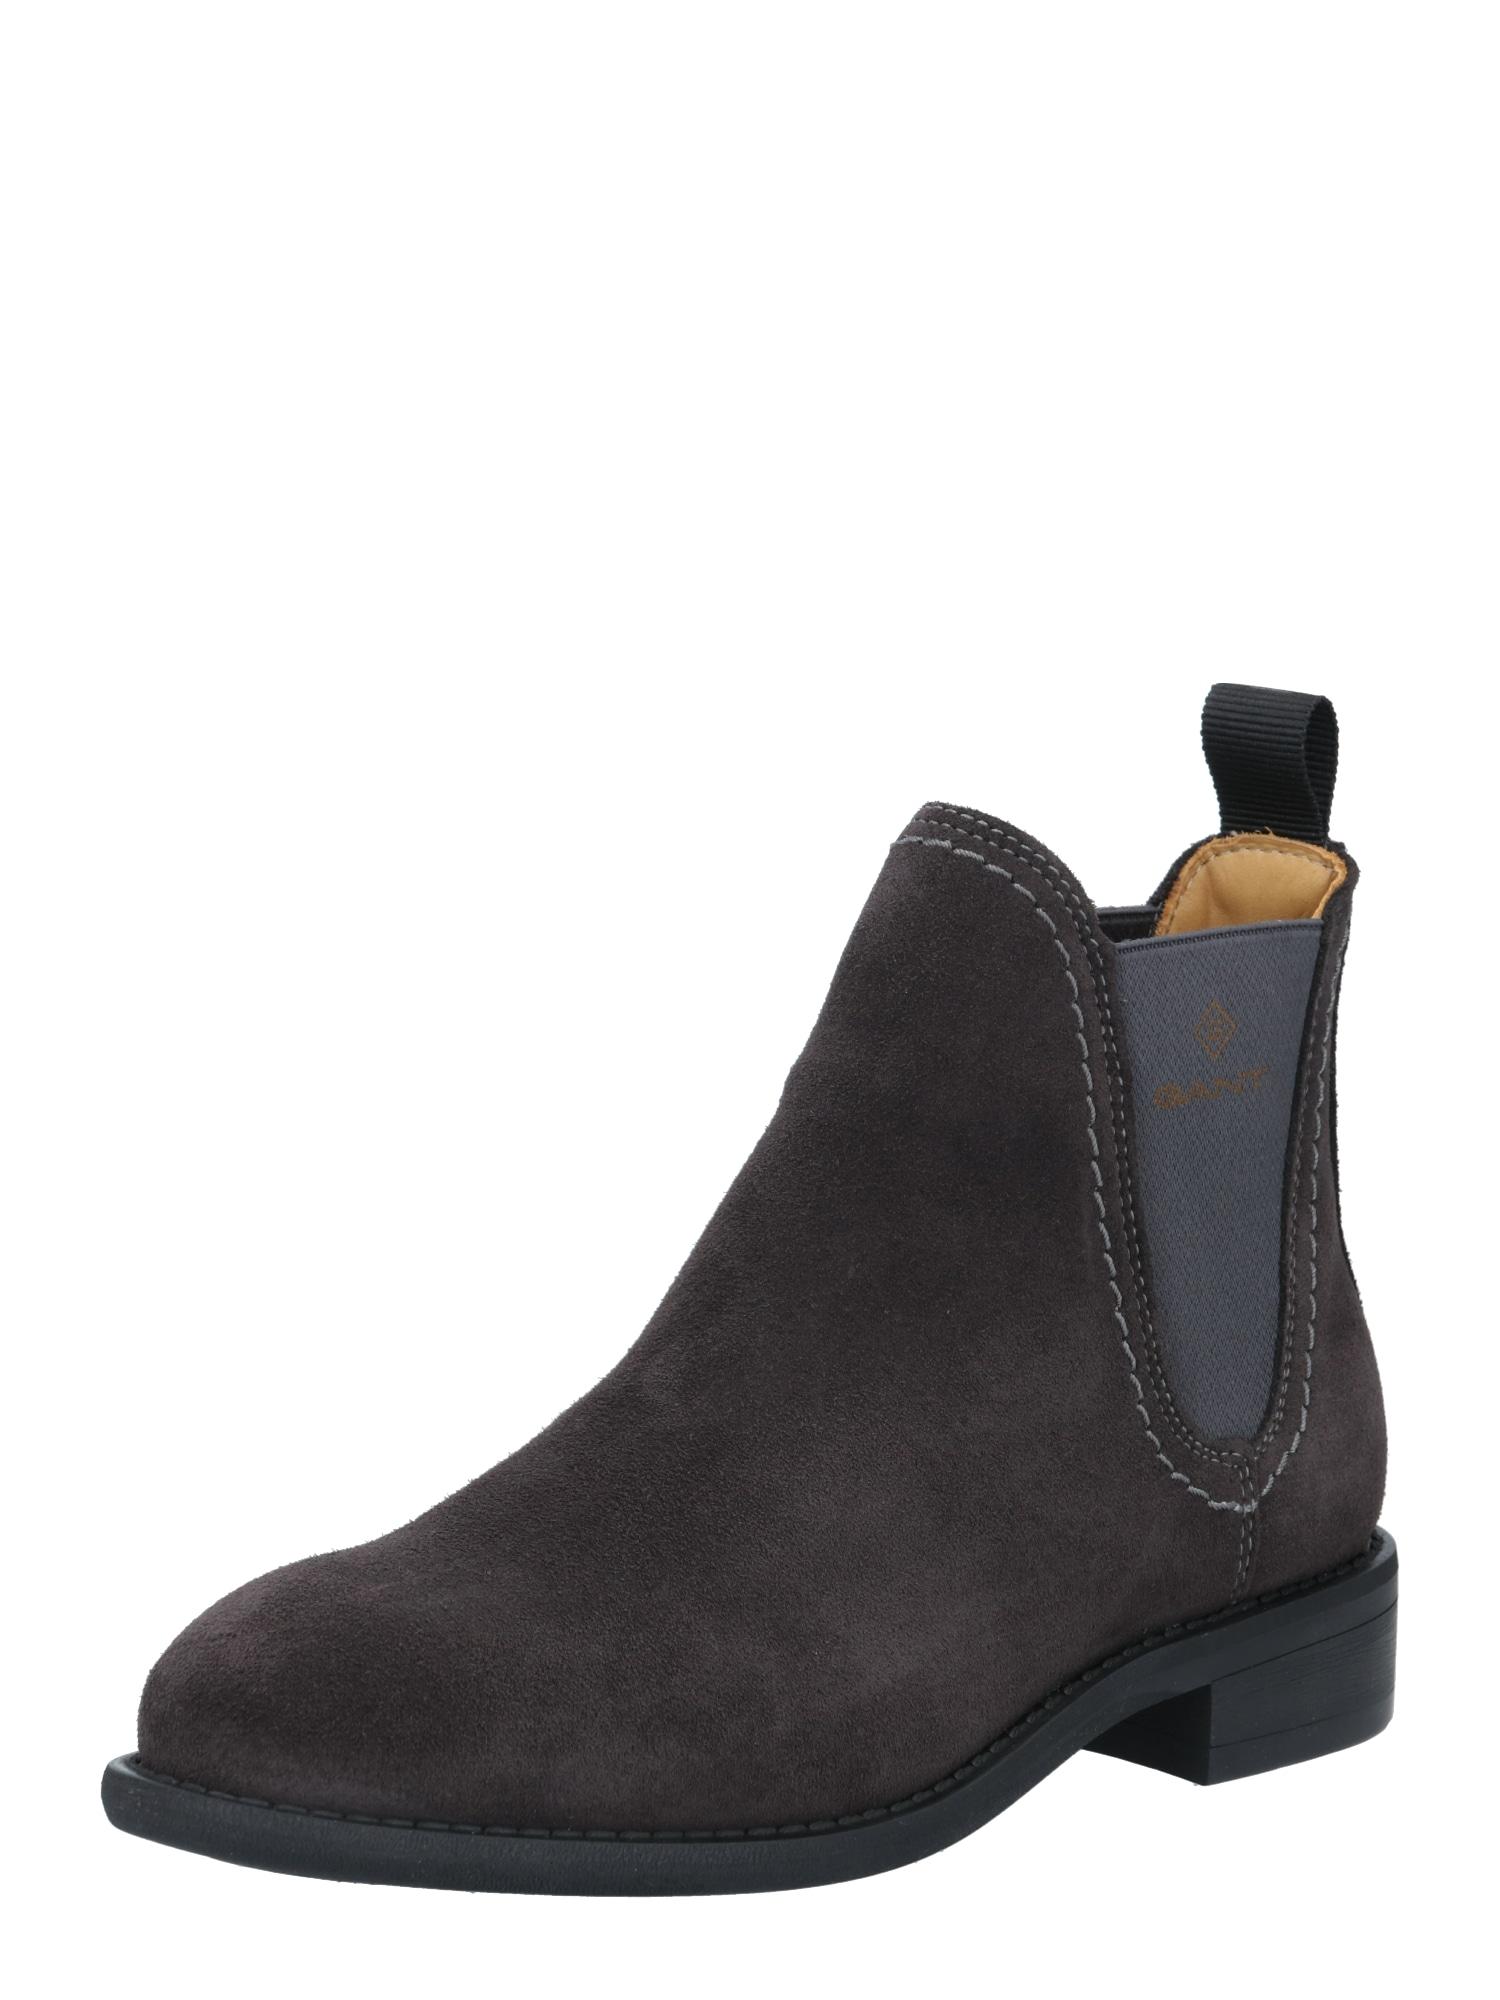 GANT Chelsea boty 'Ainsley'  medová / šedý melír / tmavě šedá